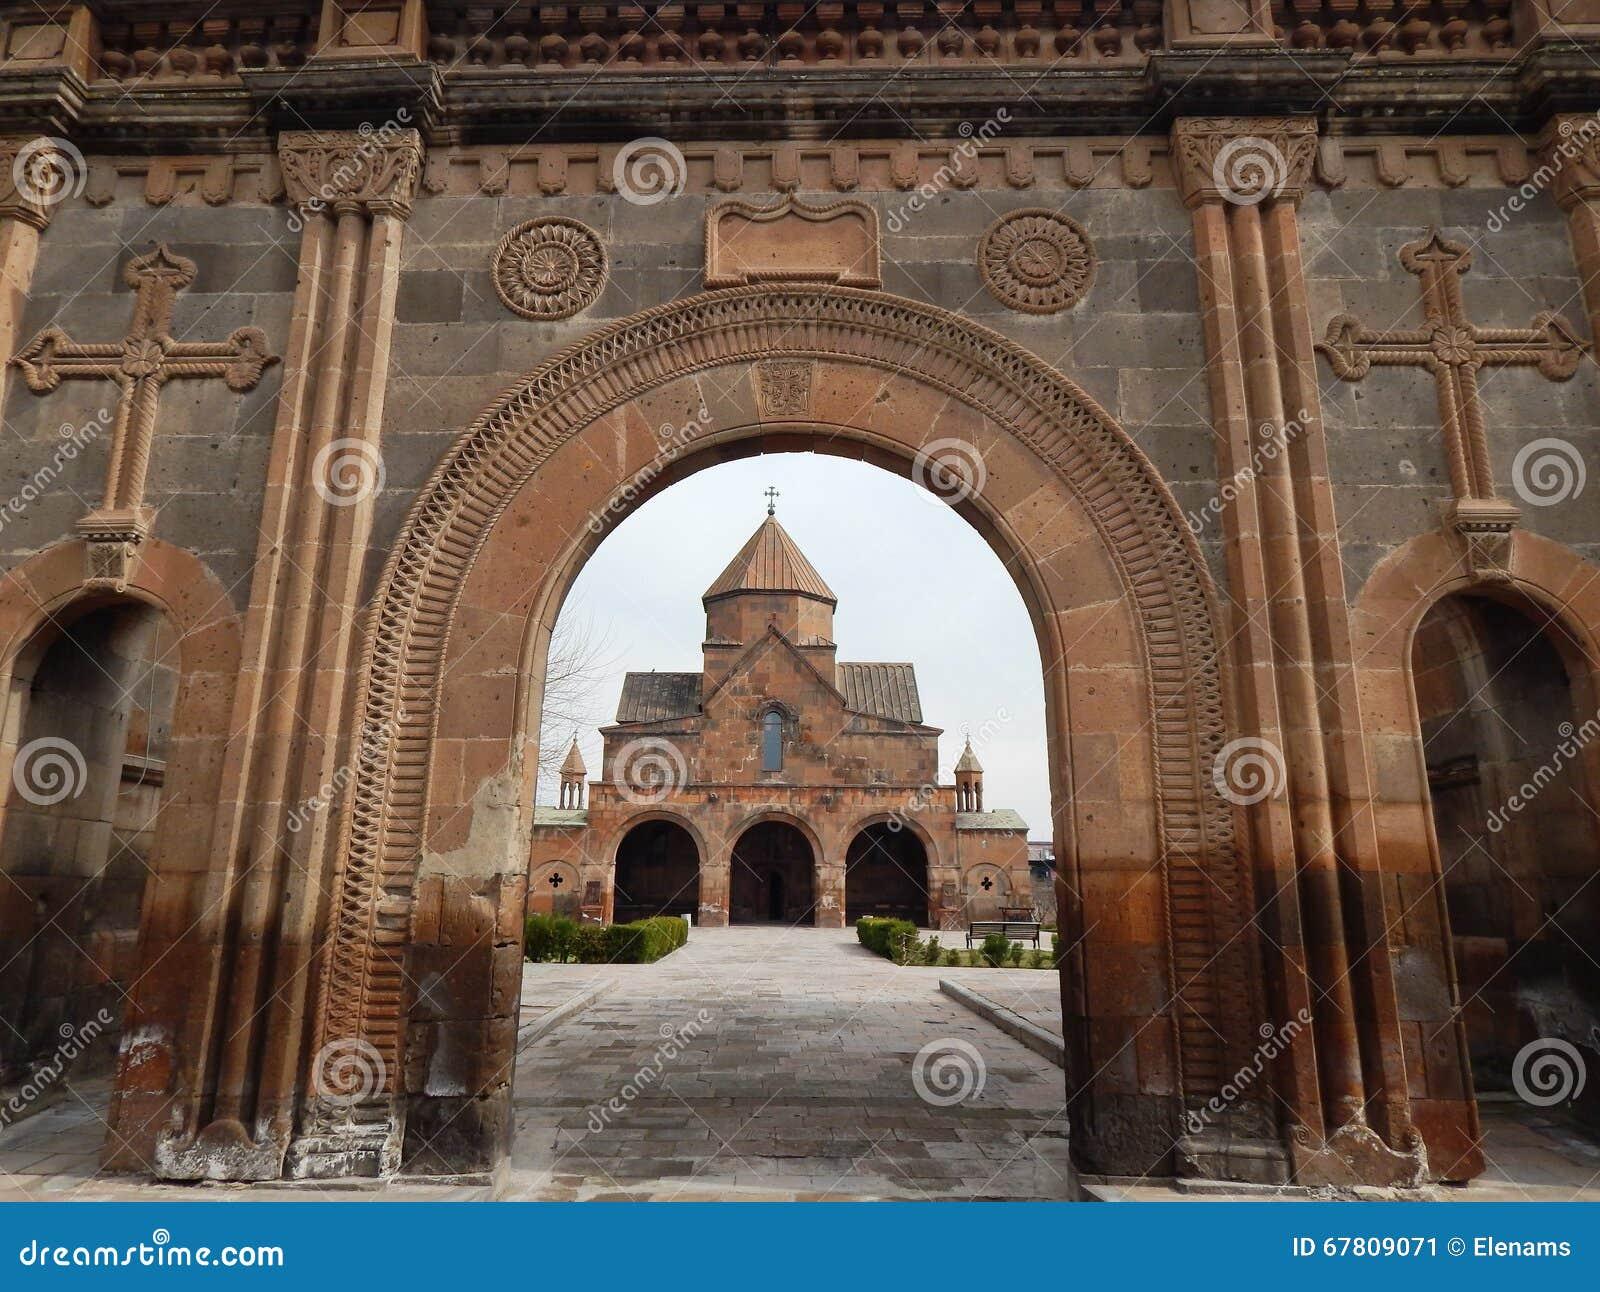 The Church of Saint Gayane (7th century) in Armenia.